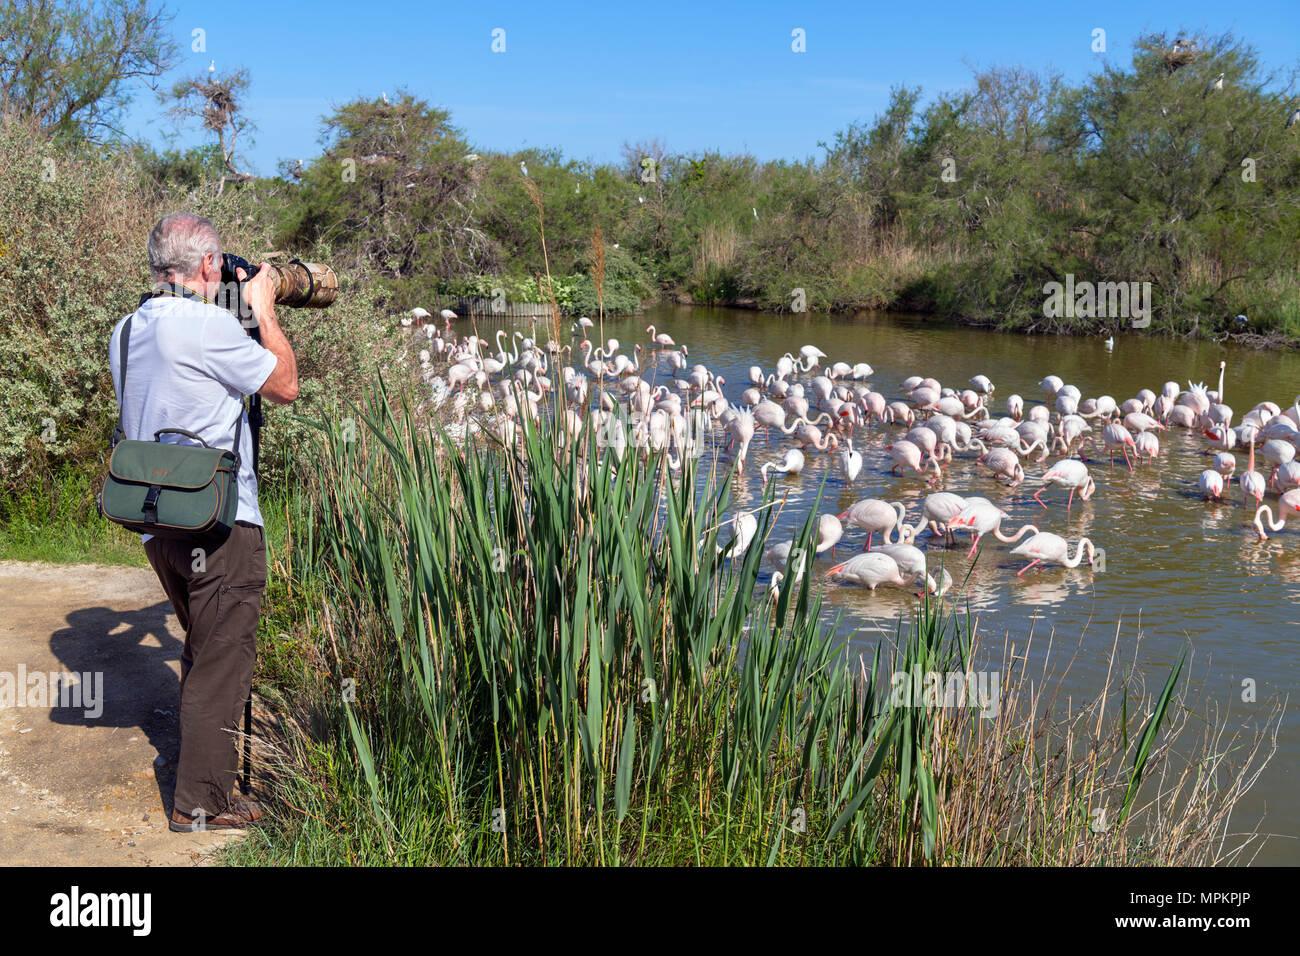 Camargue, France. Photographer taking pictures of Greater Flamingos (Phoenicopterus roseus) in the Parc ornithologique du Pont de Gau, Camargue, Prove - Stock Image